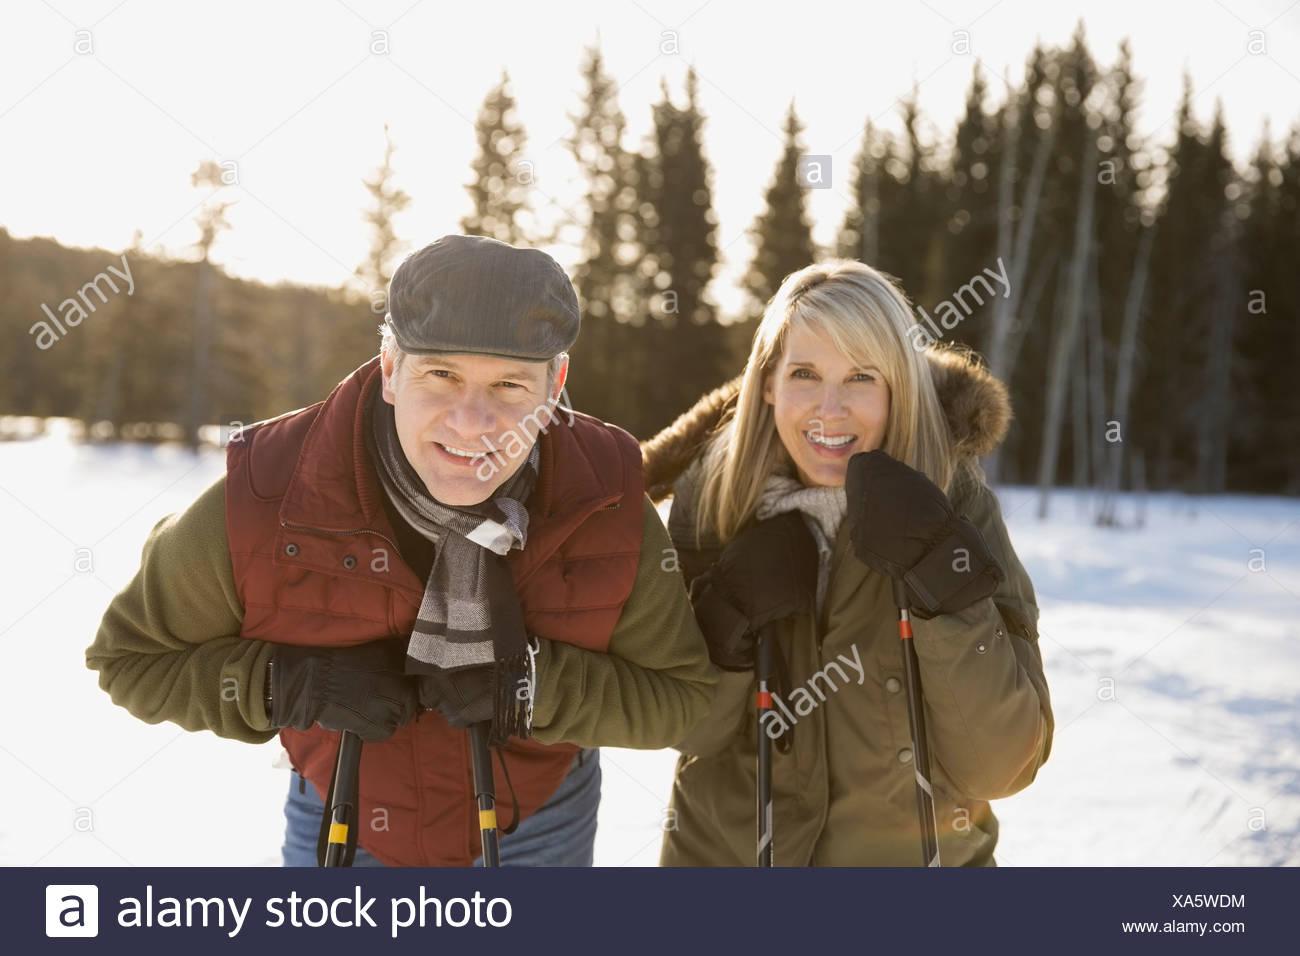 Portrait of smiling couple holding ski poles outdoors - Stock Image